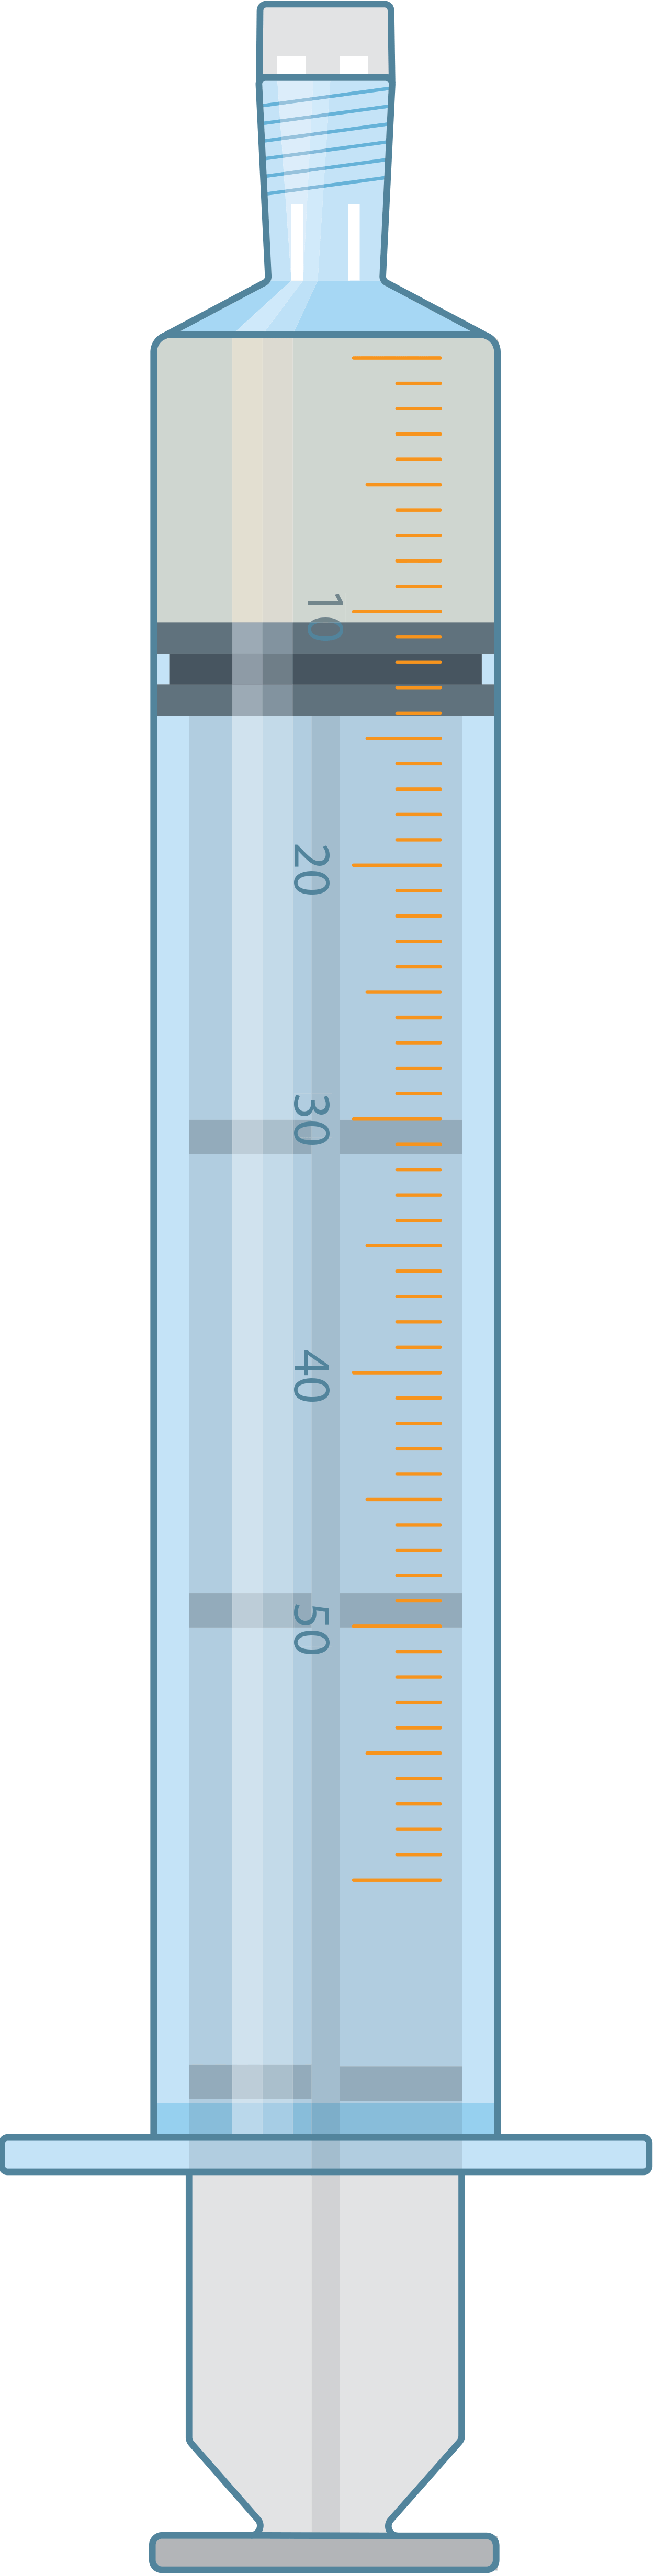 Prikkelende-innovatie_spuit